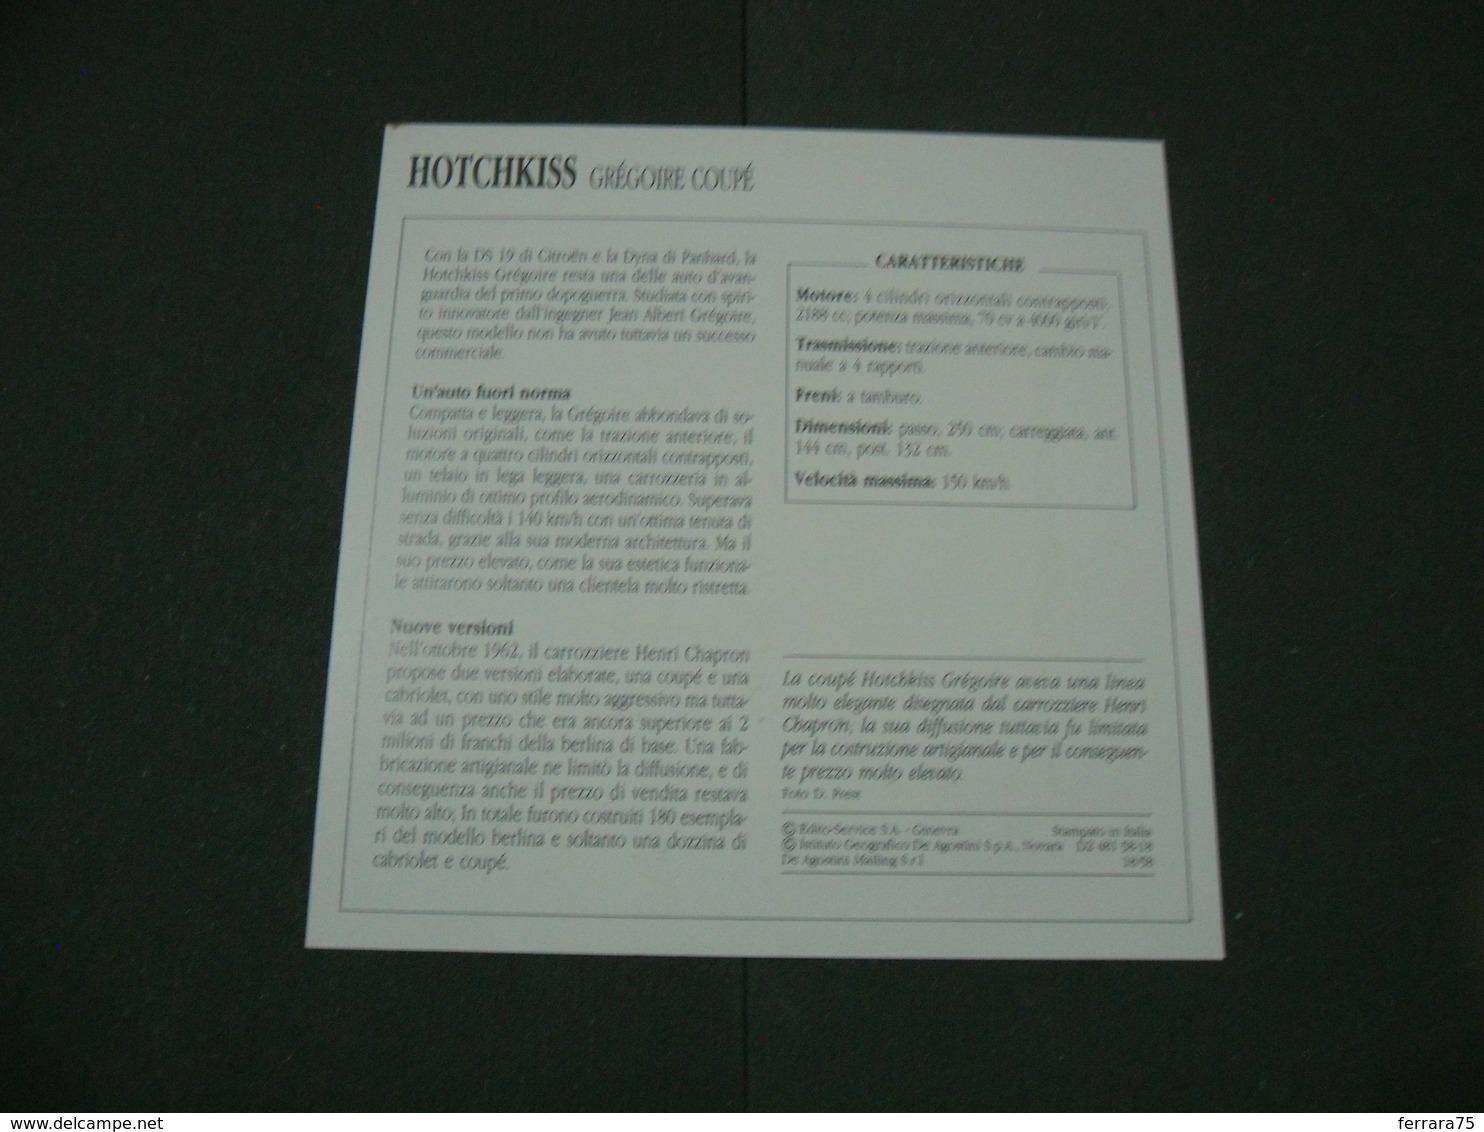 CARTOLINA CARD SCHEDA TECNICA  AUTO  CARS  HOTCHKISS GREGOIRE COUPè - Altre Collezioni